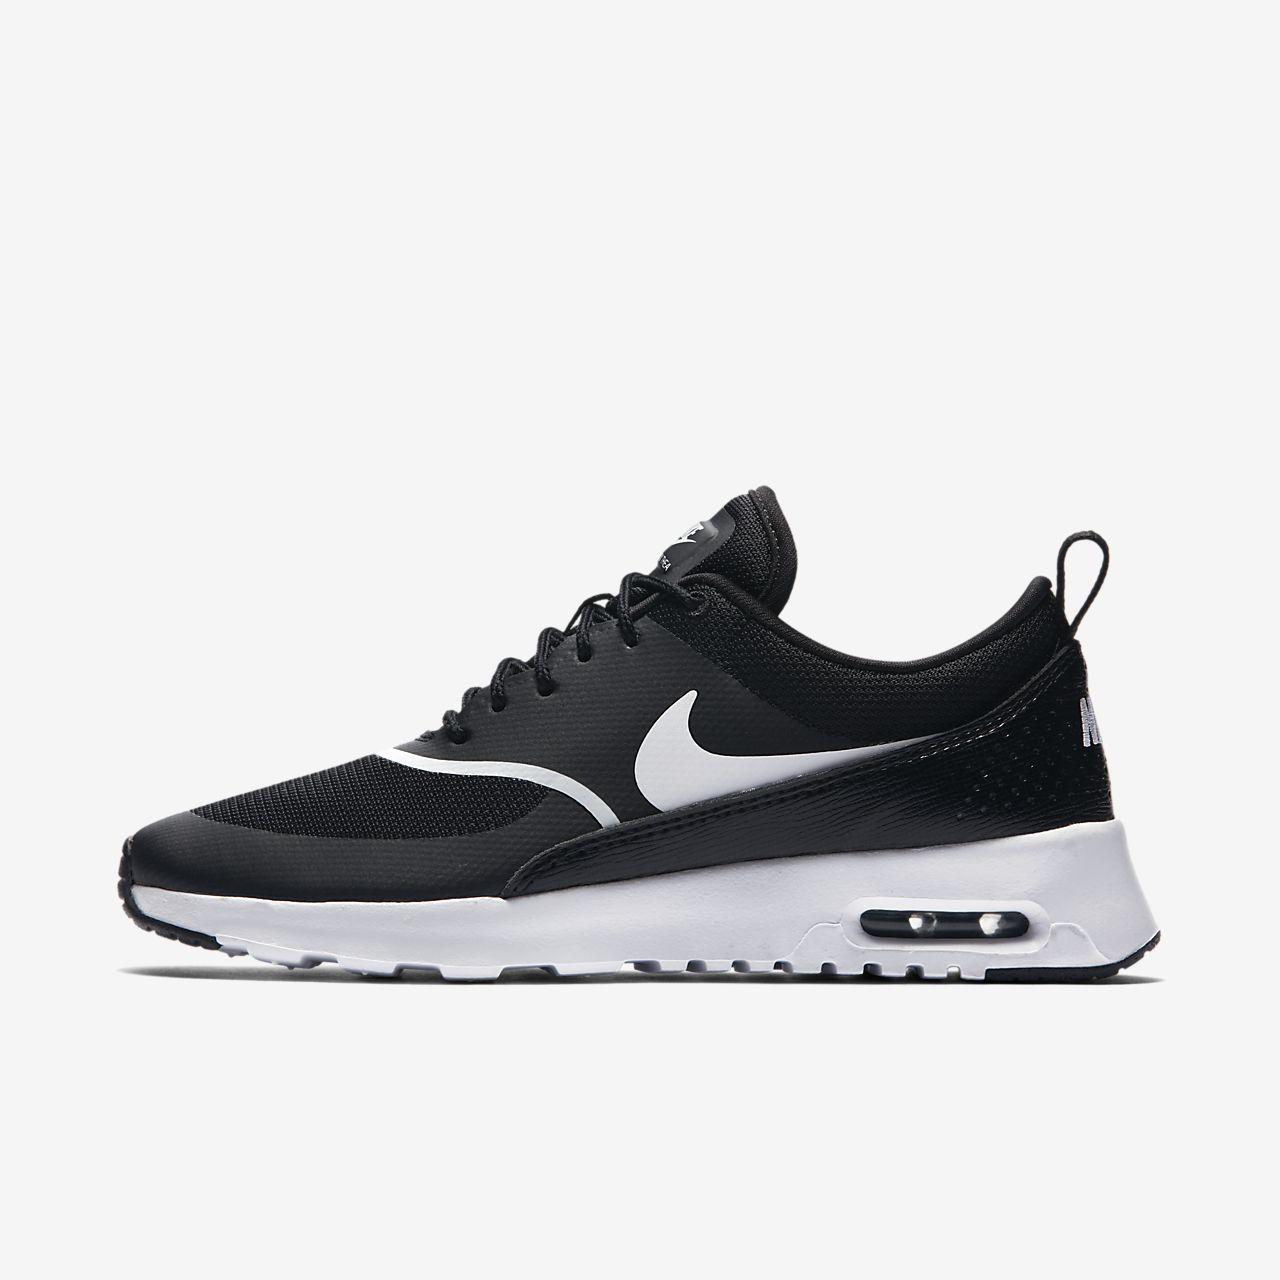 size 40 782f2 afab5 ... Nike Air Max Thea Sabatilles - Dona